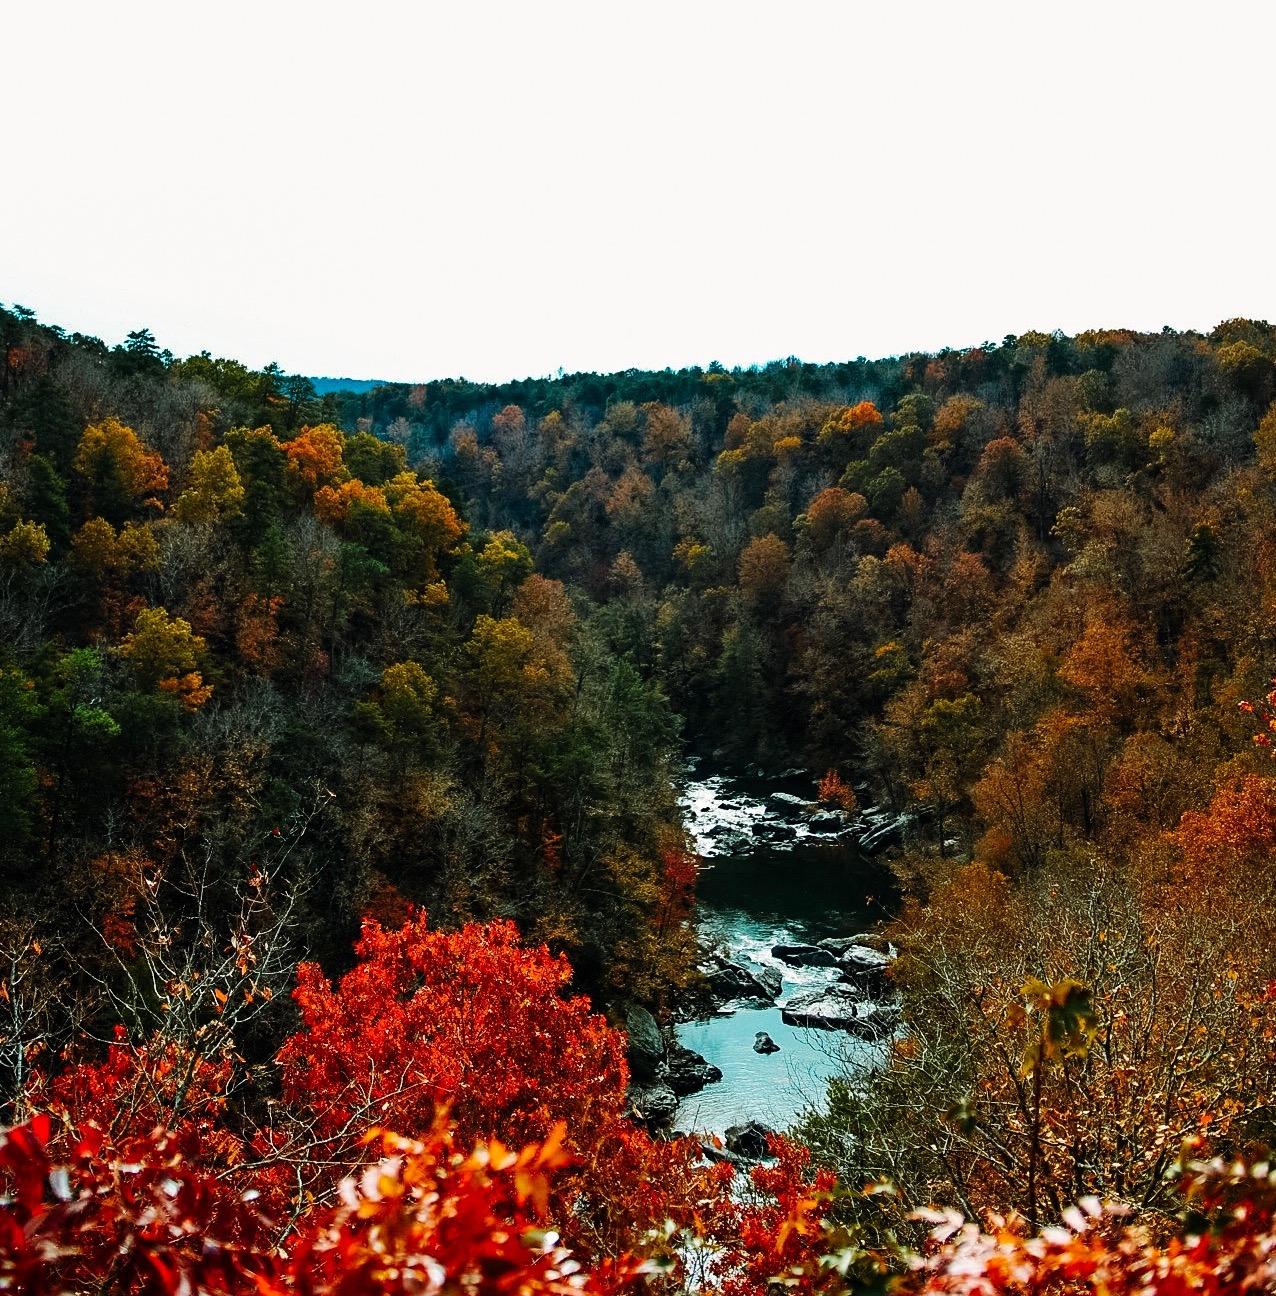 Birmingham, Little River Canyon